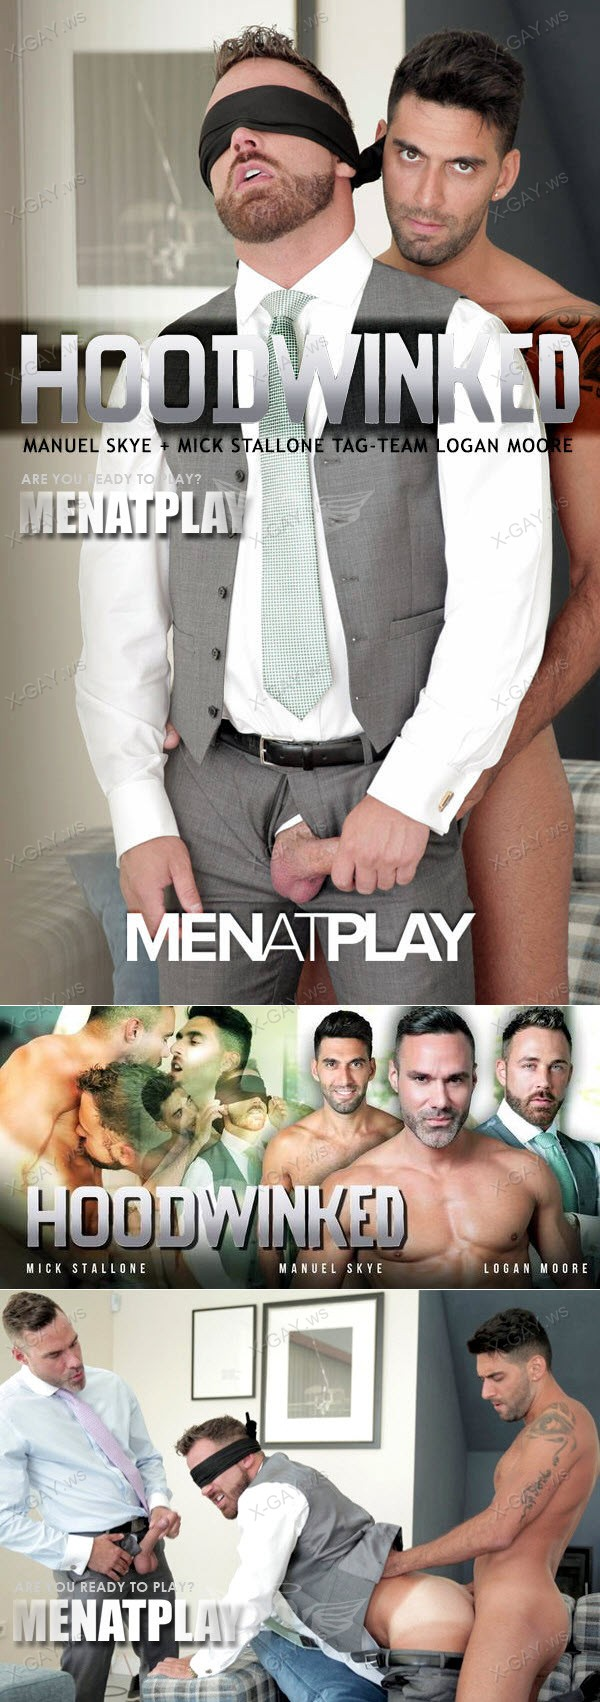 MenAtPlay: Hoodwinked (Mick Stallone, Manuel Skye, Logan Moore)